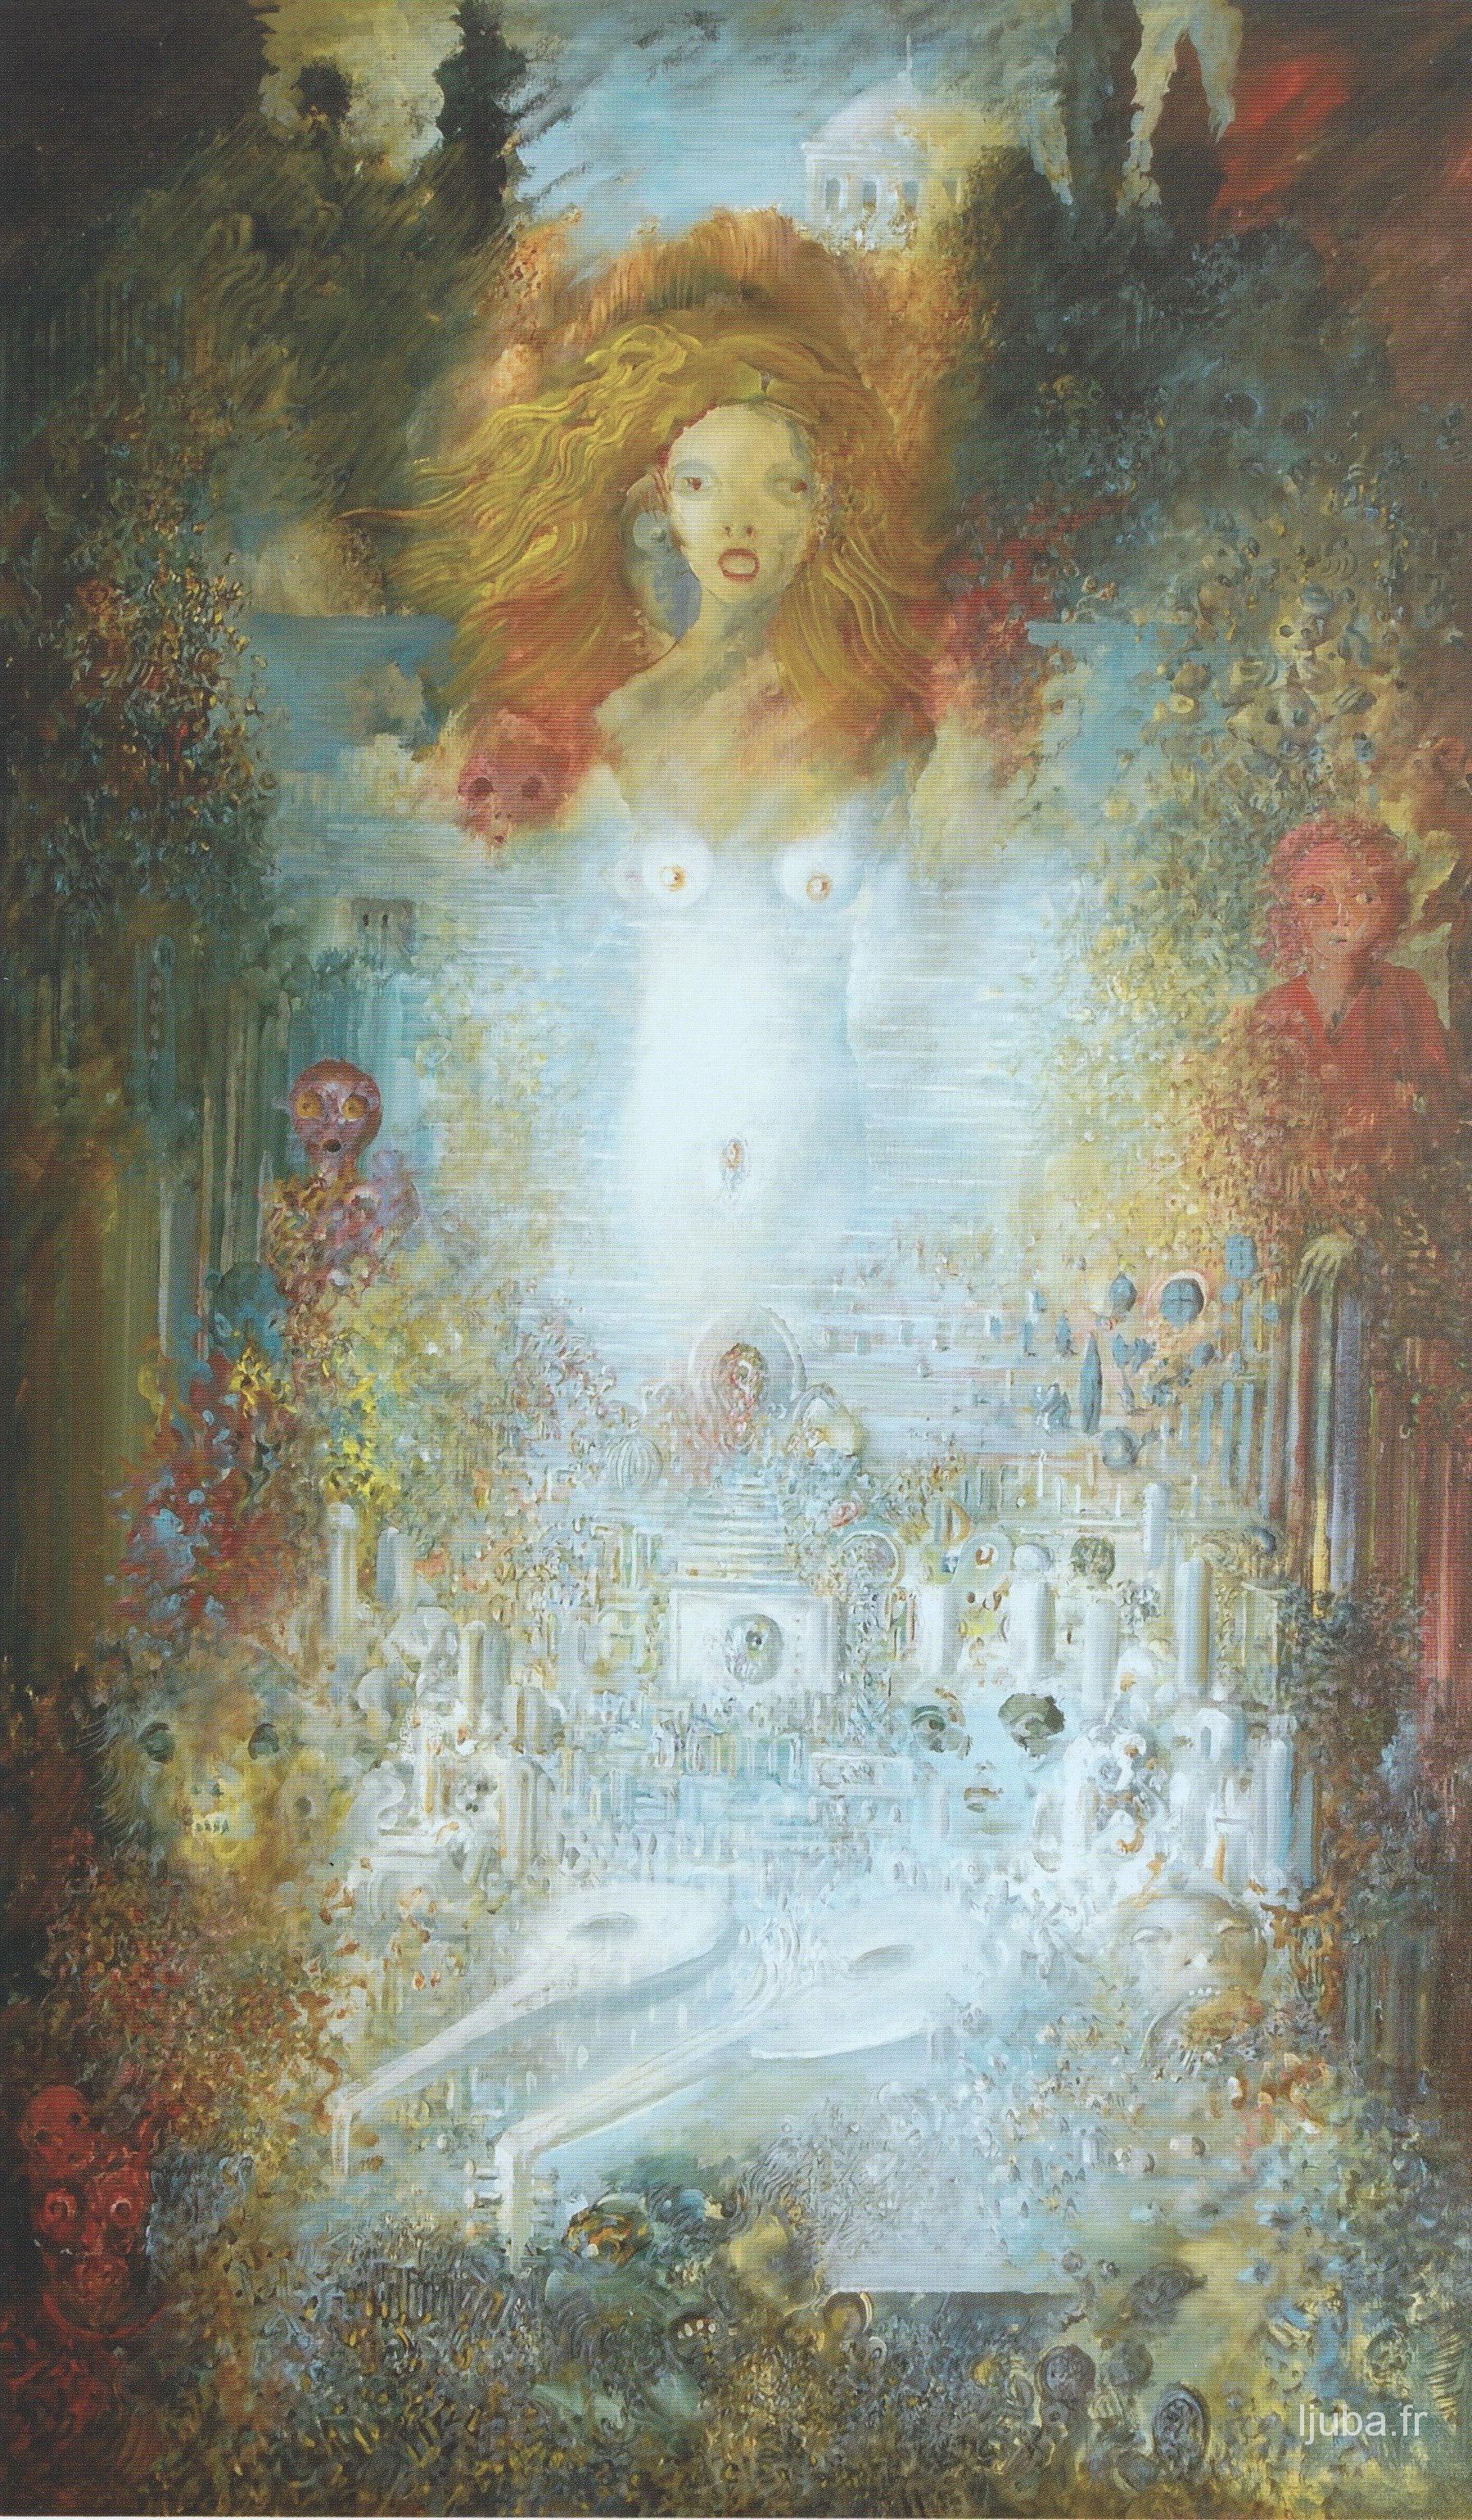 Ljuba Popovic - 2007, U čast Gistava Moroa